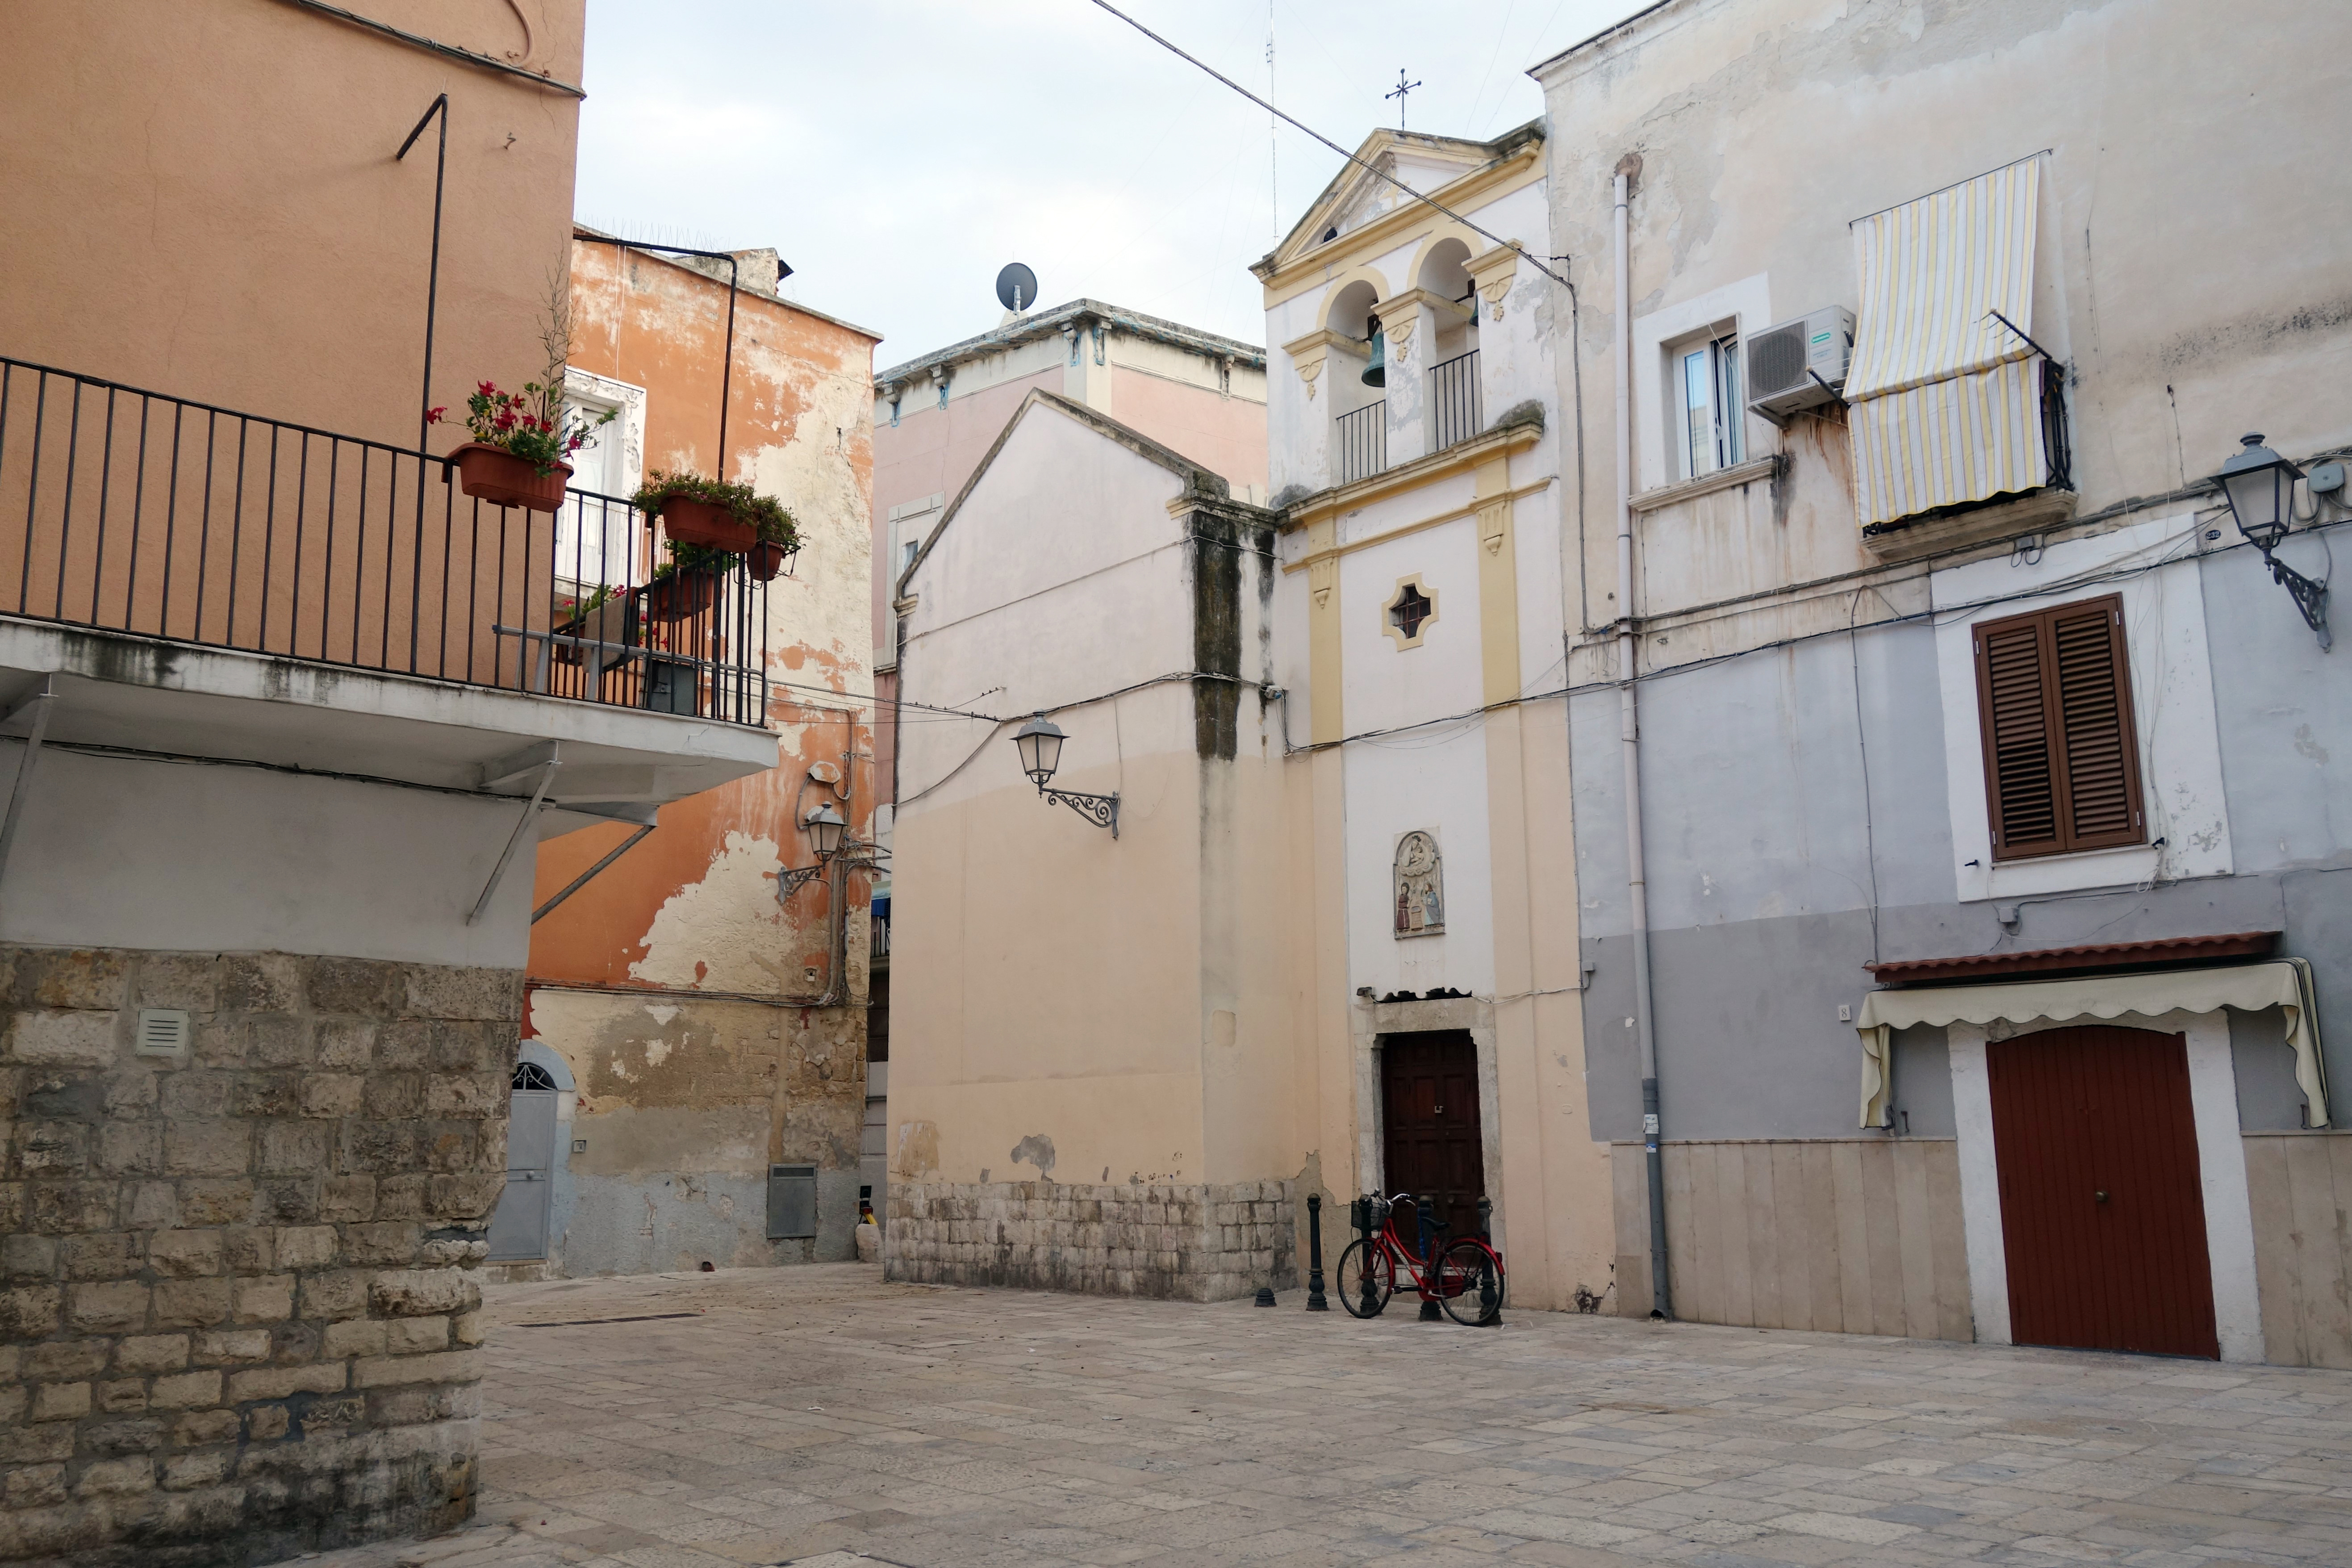 Visiter Bari – Mon city guide